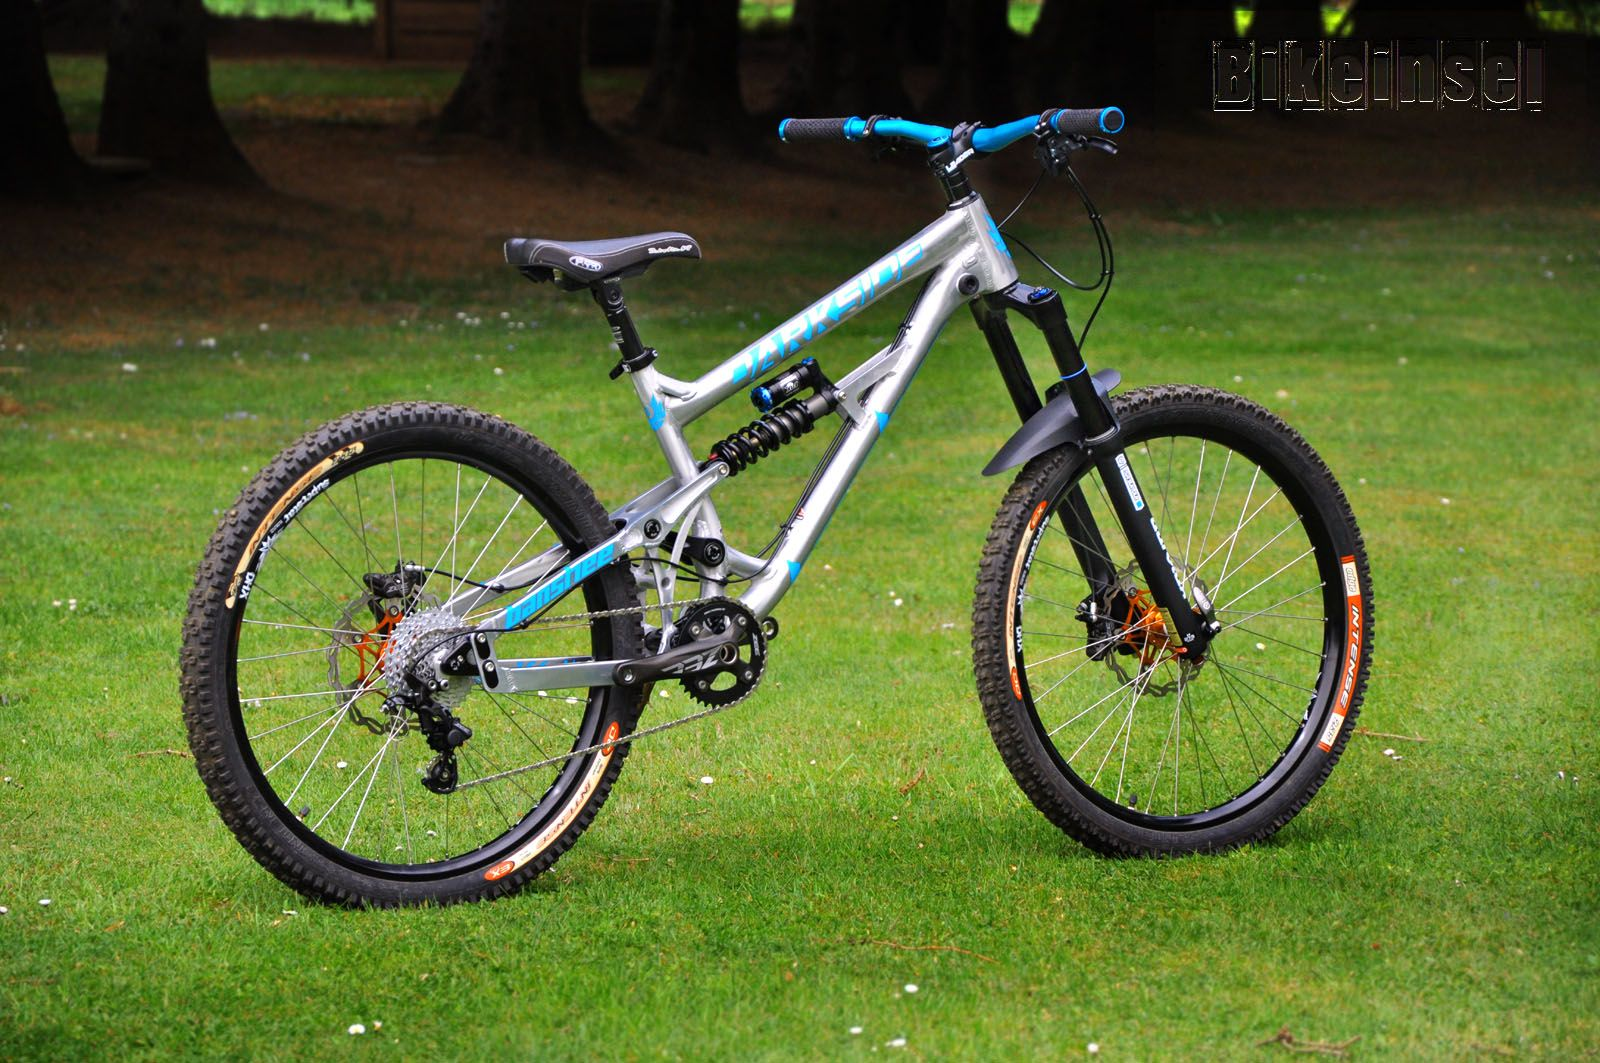 2463b747f Banshee  Darkside  bikeinsel custom bike by www.bikeinsel.com